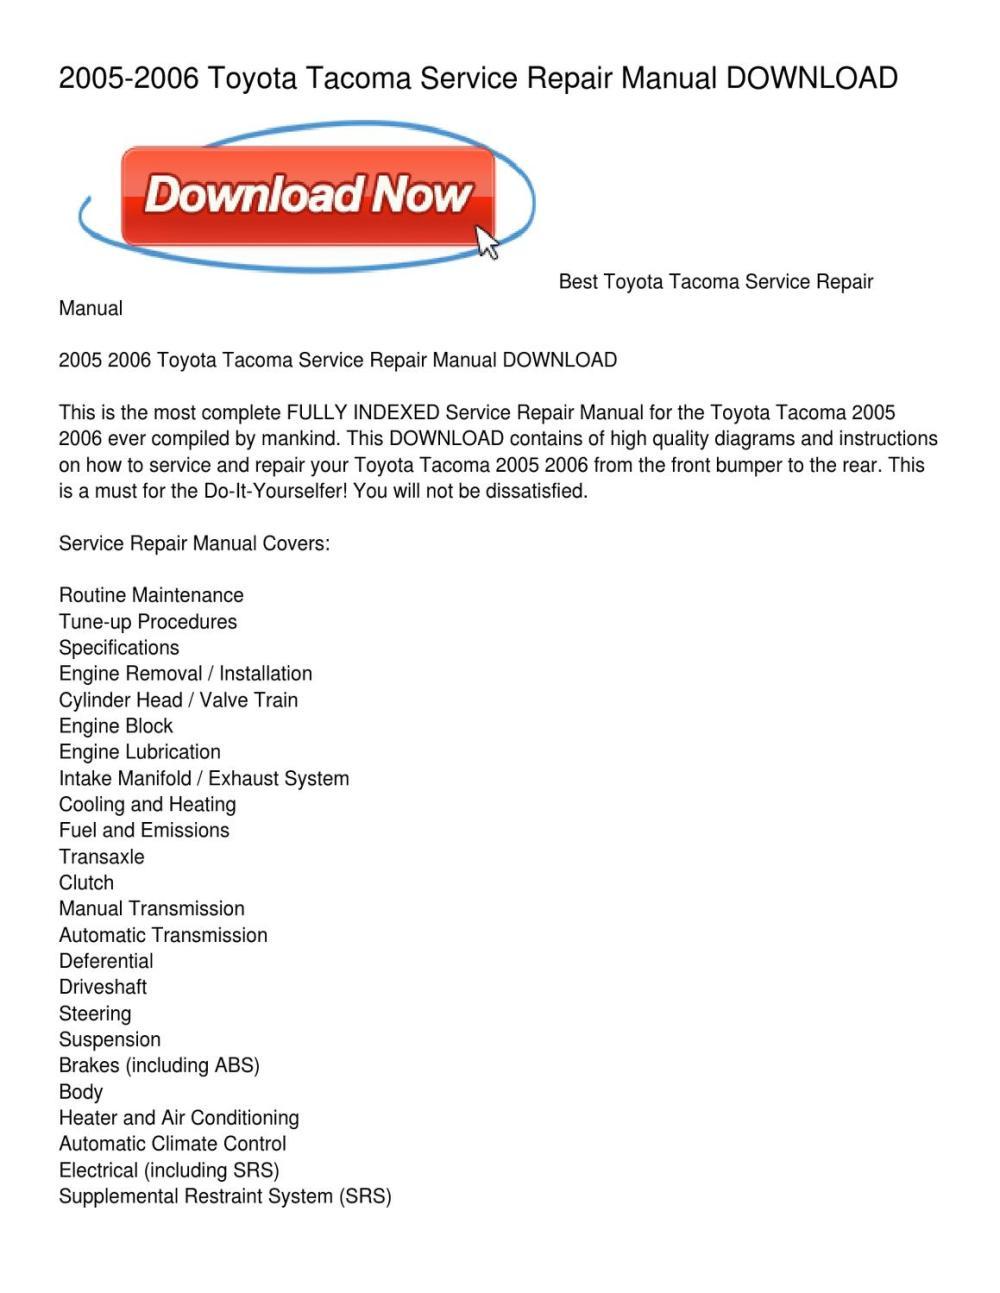 medium resolution of 2005 2006 toyota tacoma service repair manual download